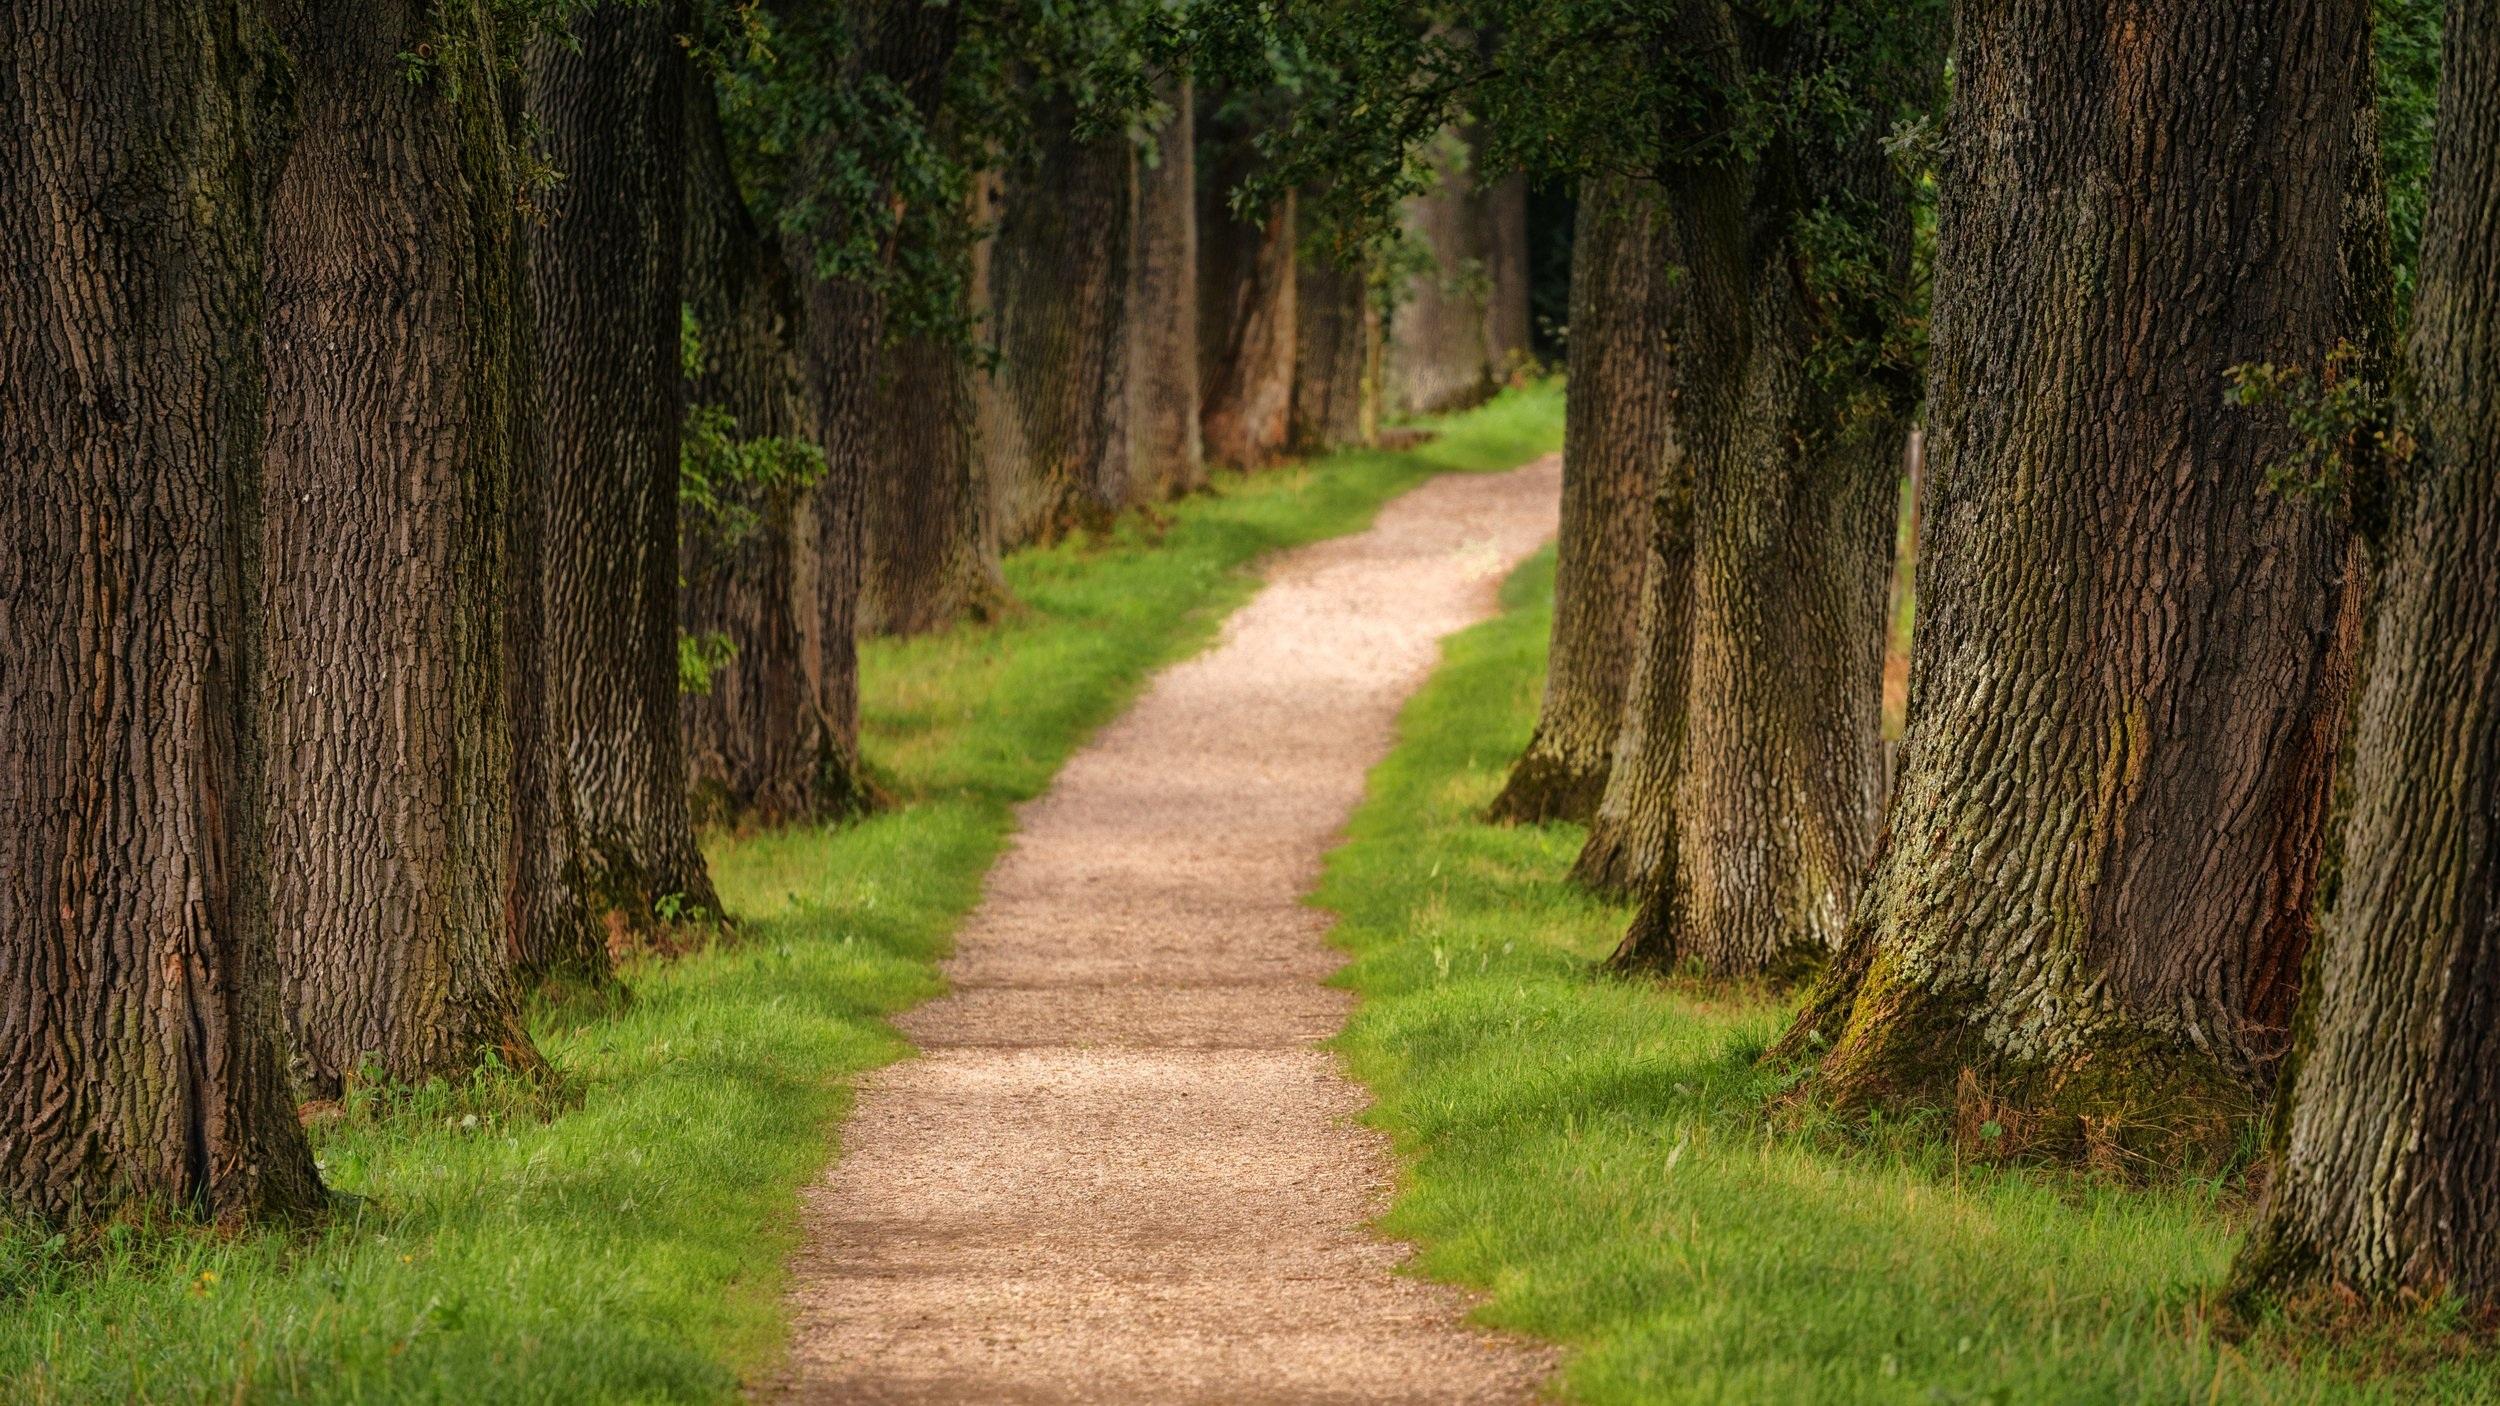 tree+lined+path.jpg